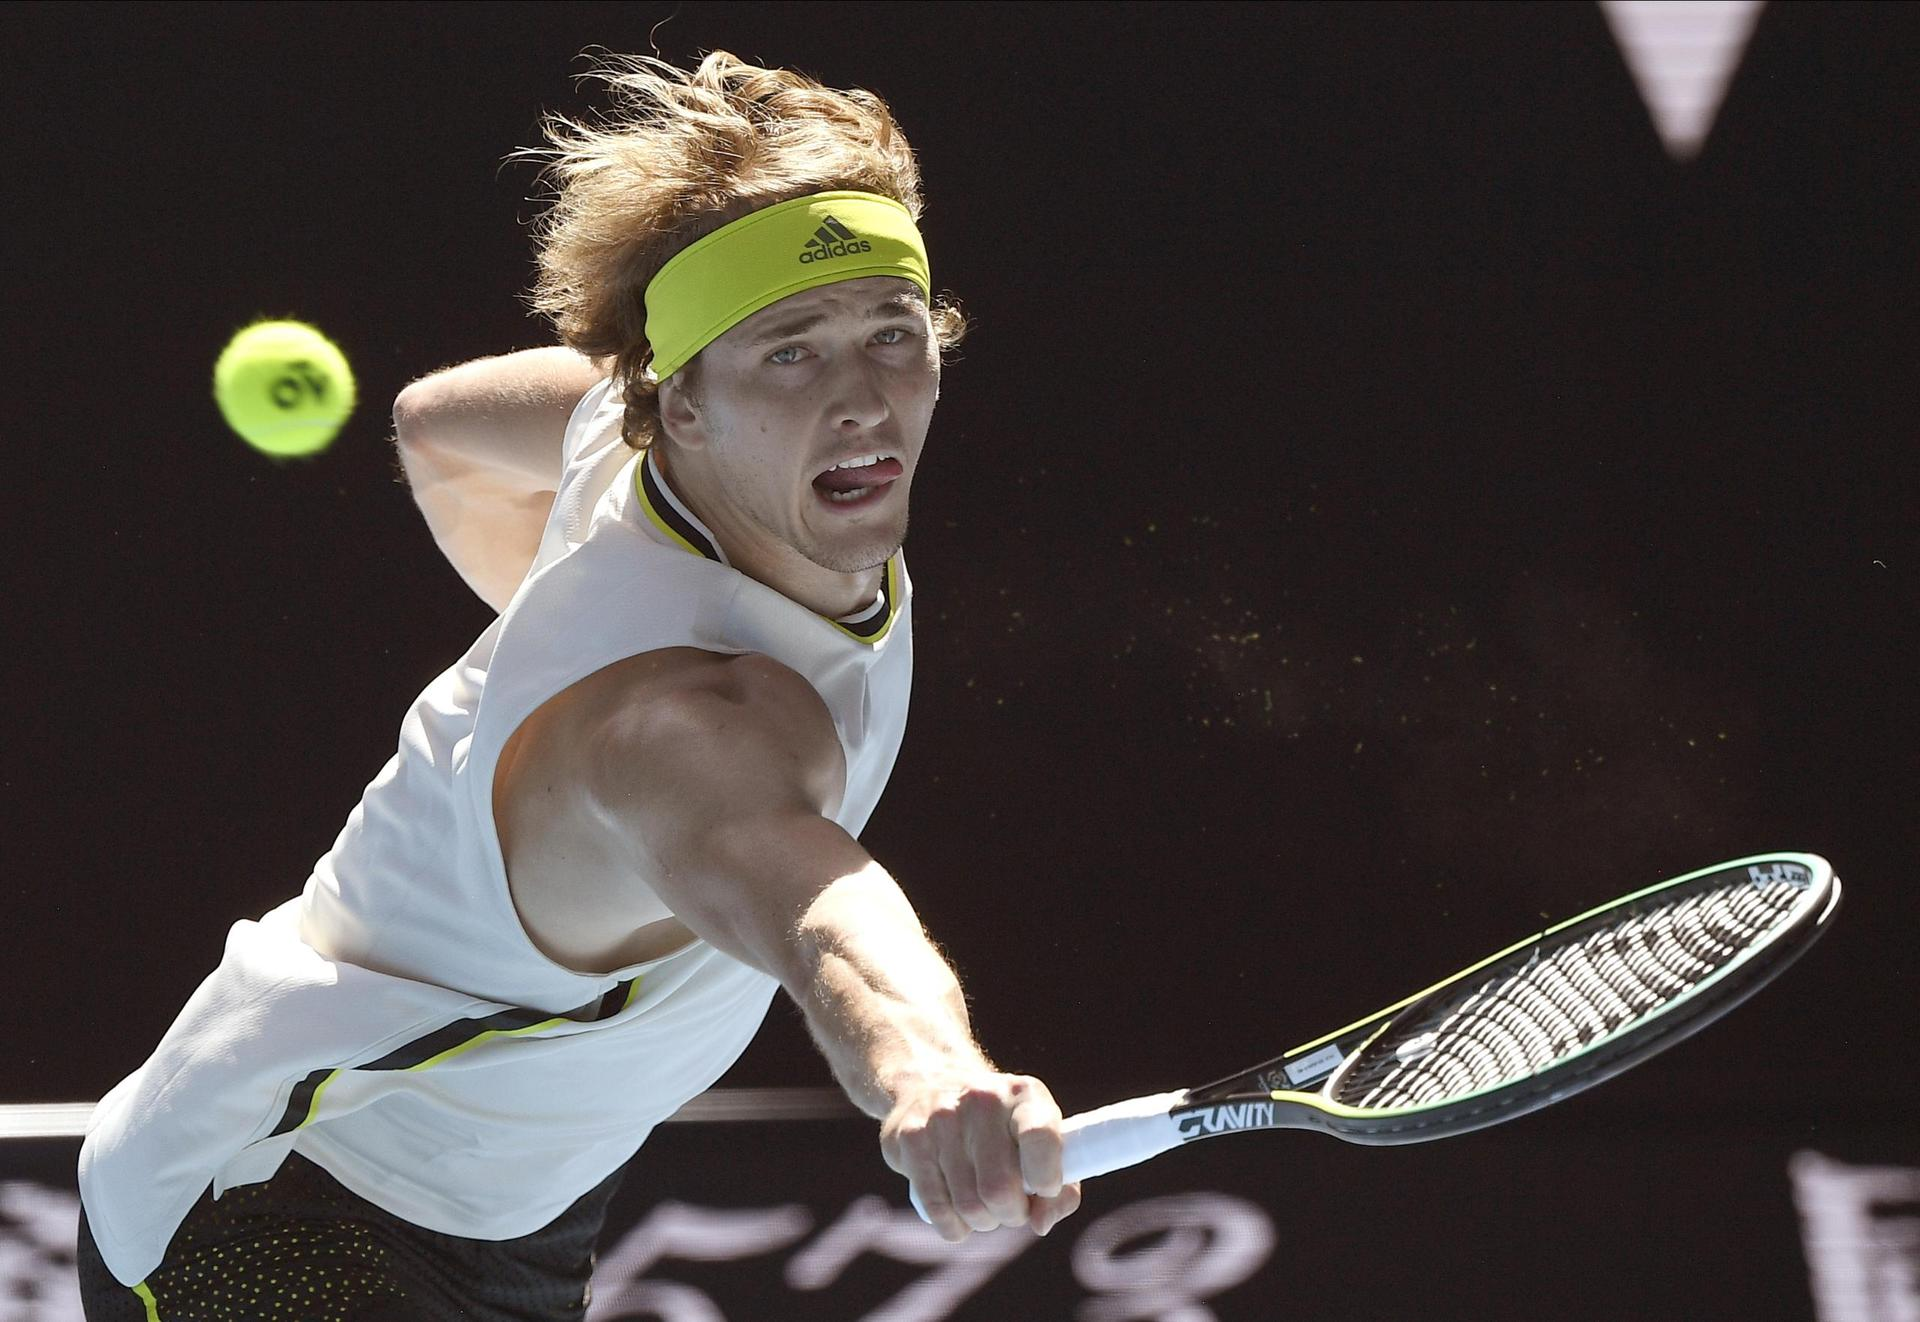 Starker Zverev in Melbourne im Achtelfinale Australian Open